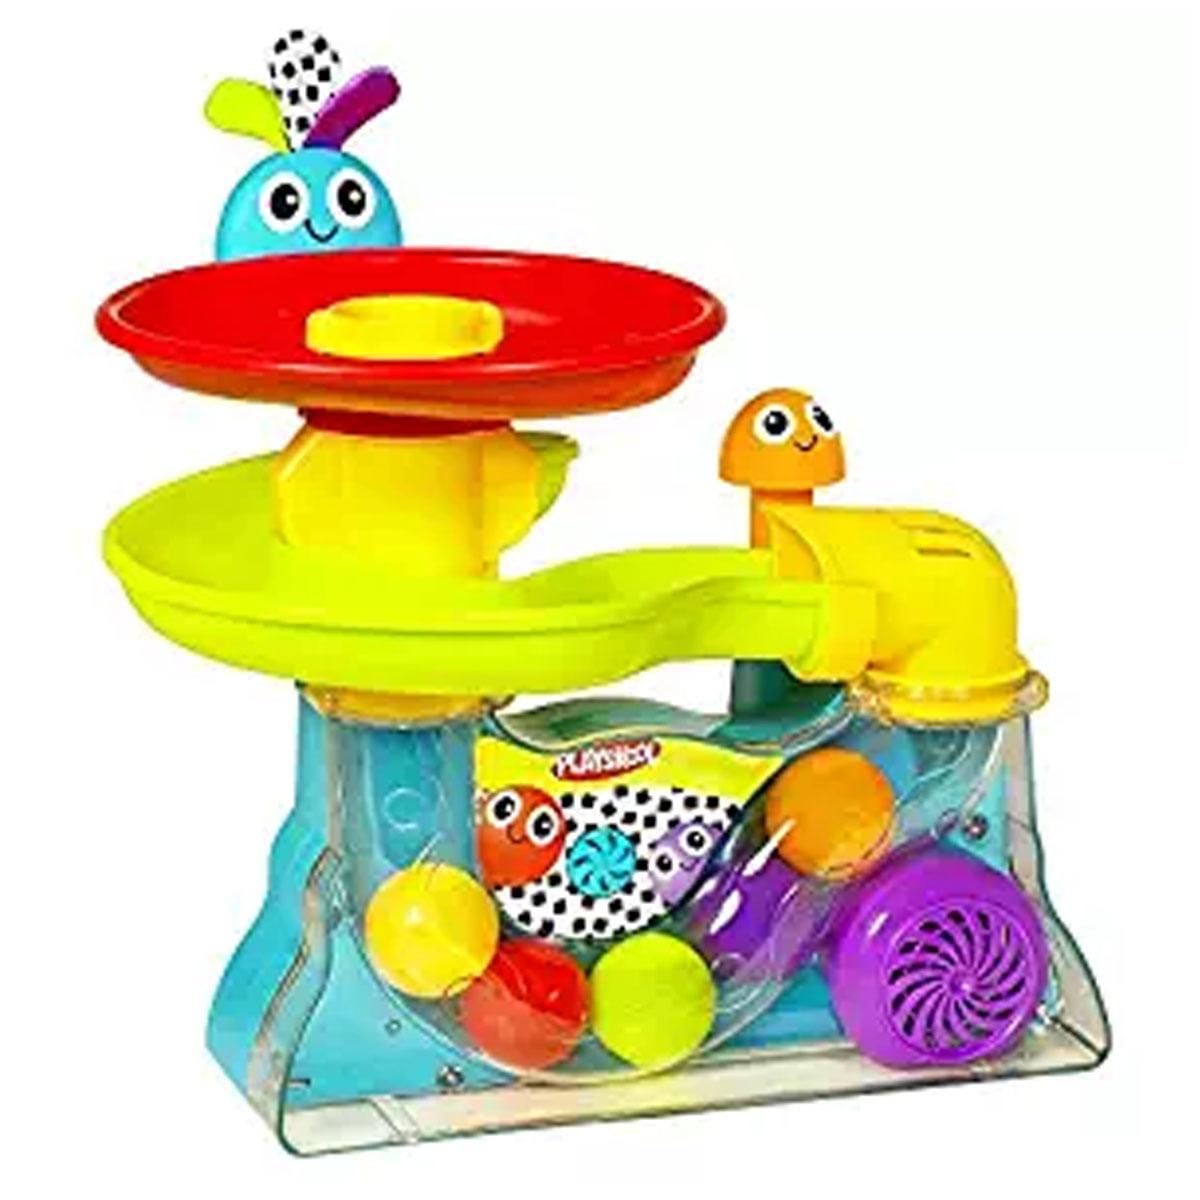 Playskool Explore N'Grow Busy Ball Popper, (OPEN BOX) by